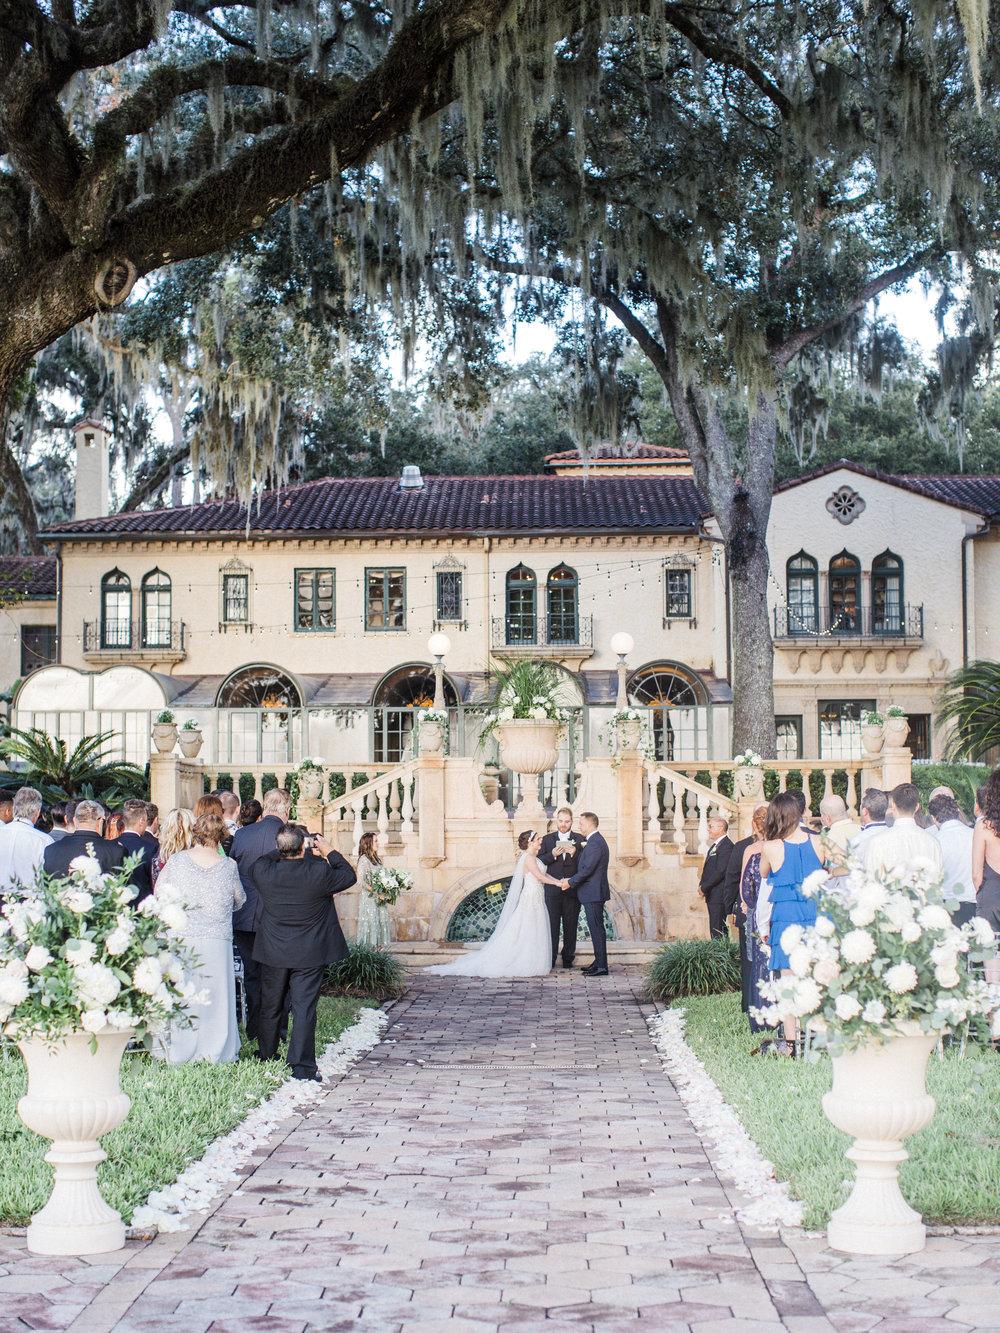 Lisa Silva Photography- Jacksonville, Florida Fine Art Film Wedding Photography 7 copy.jpg